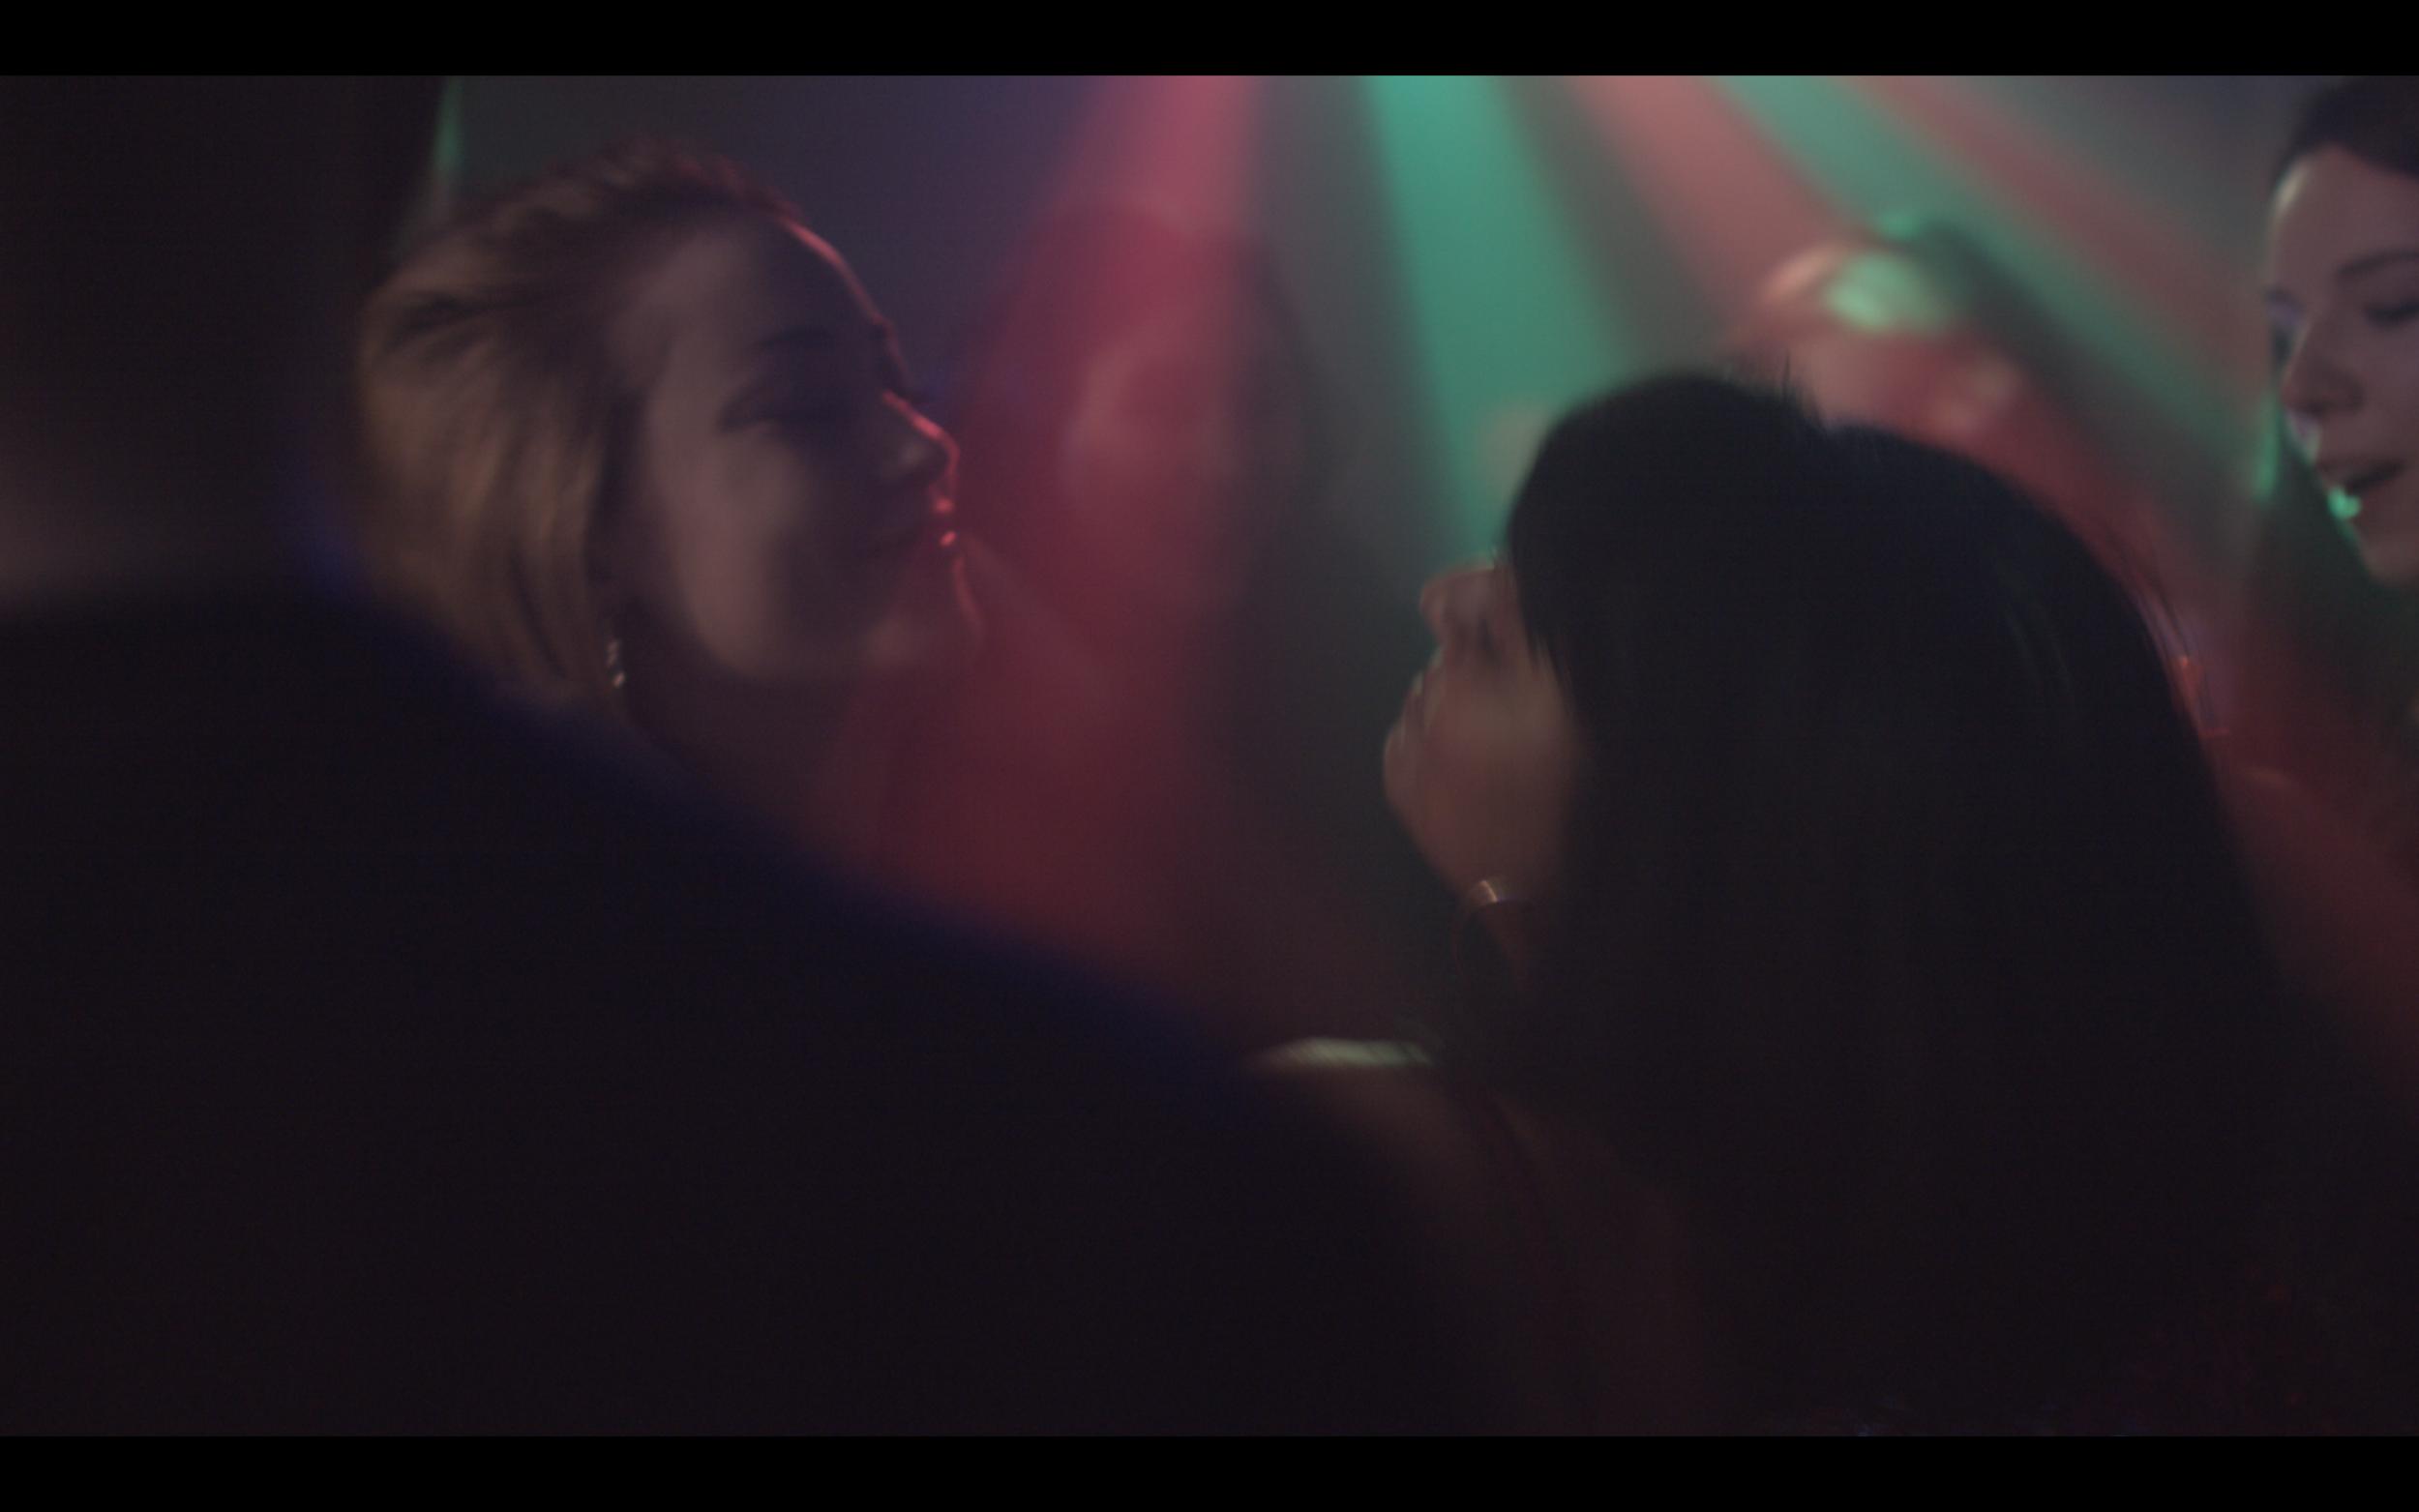 Club Scene, Things We Do Before Midnight